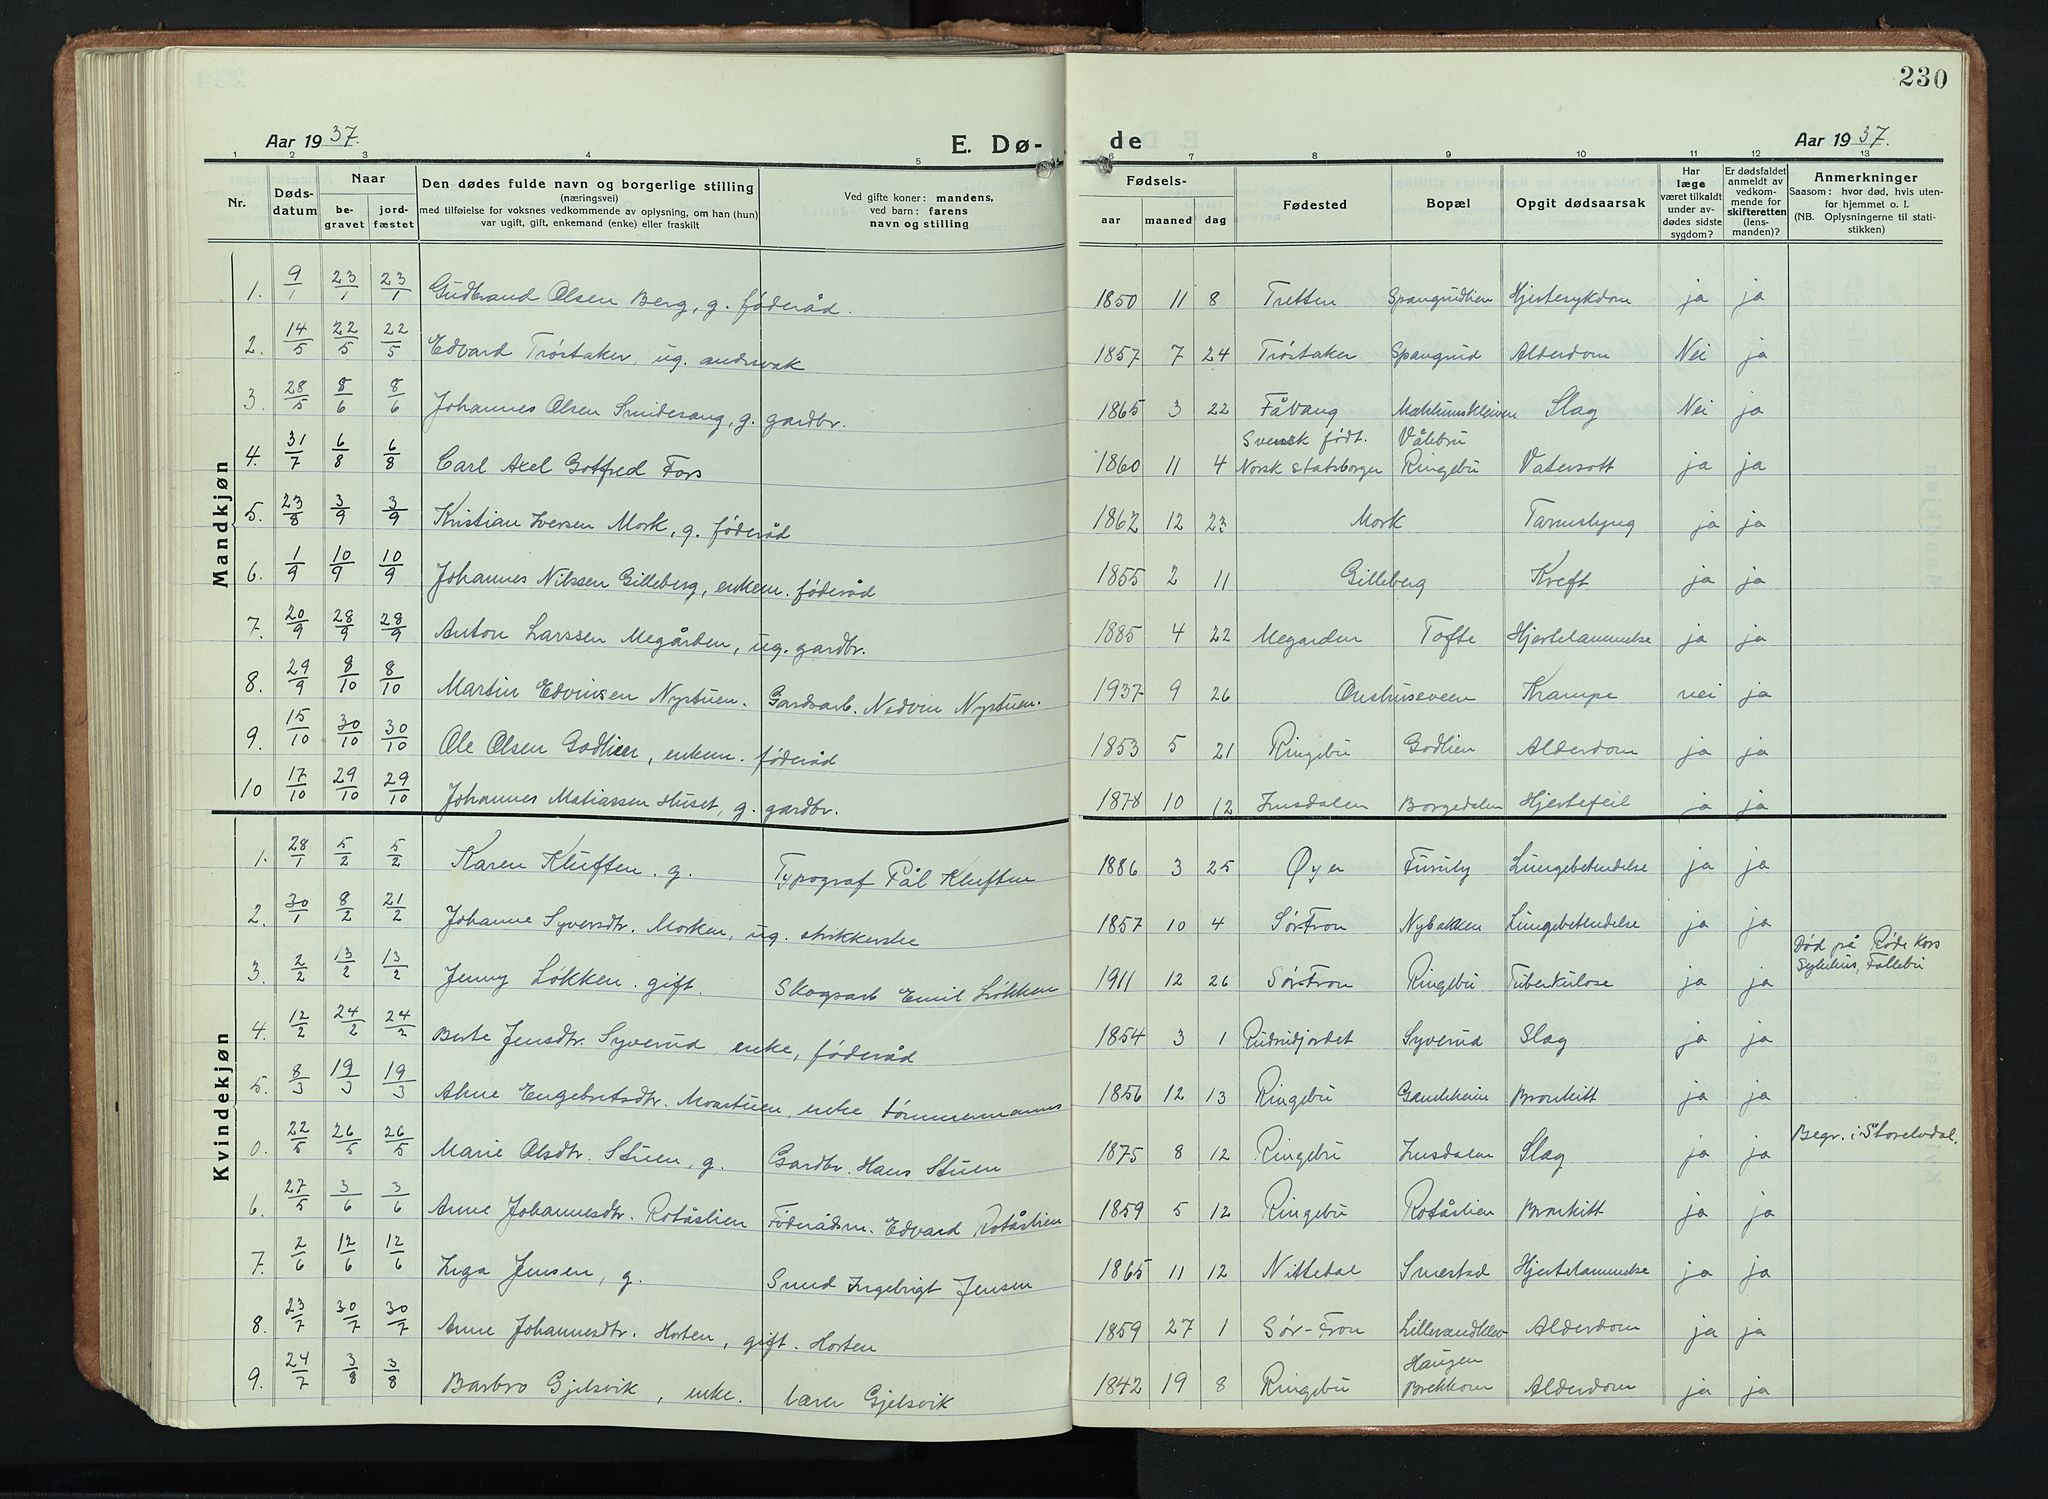 SAH, Ringebu prestekontor, Klokkerbok nr. 11, 1921-1943, s. 230